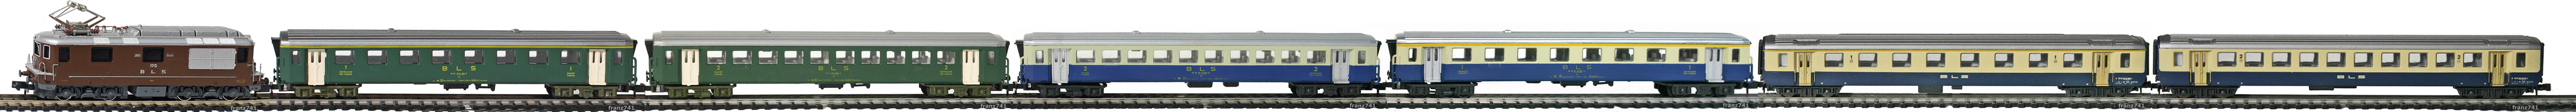 Epoche-IV-BLS-EW-I-Personenzug_Re-4-4-Elok-EW-I-Wagen-altes-Logo